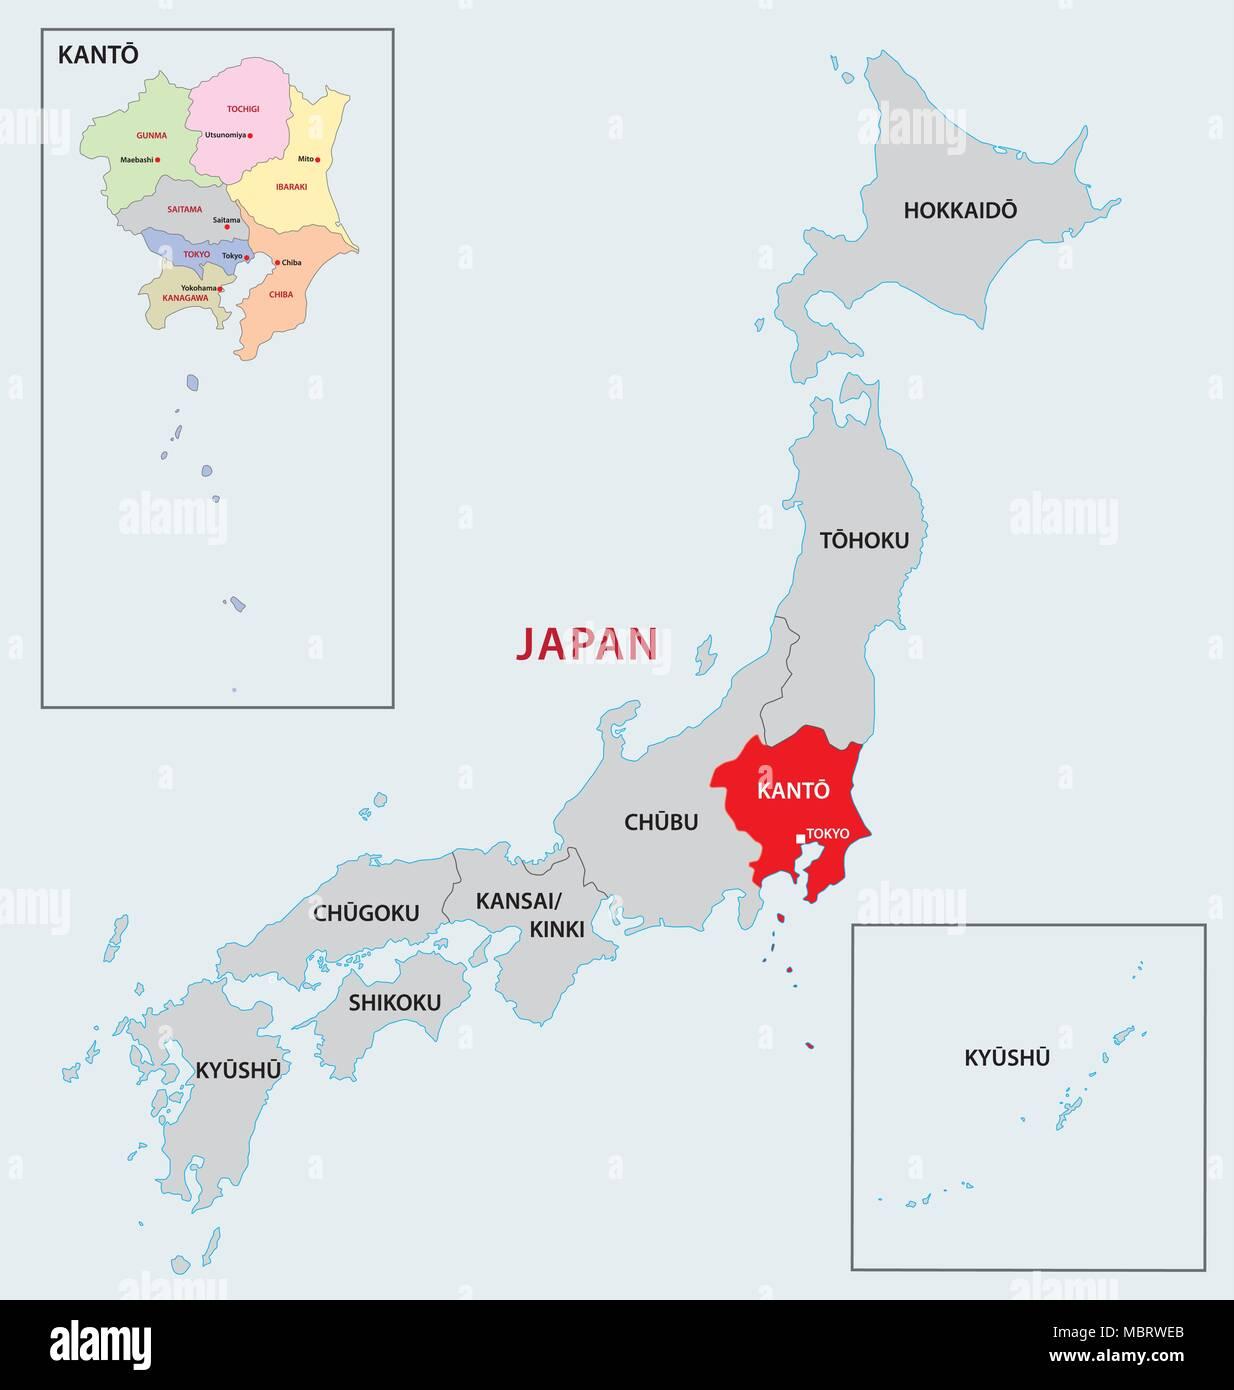 japan region kanto map - Stock Vector